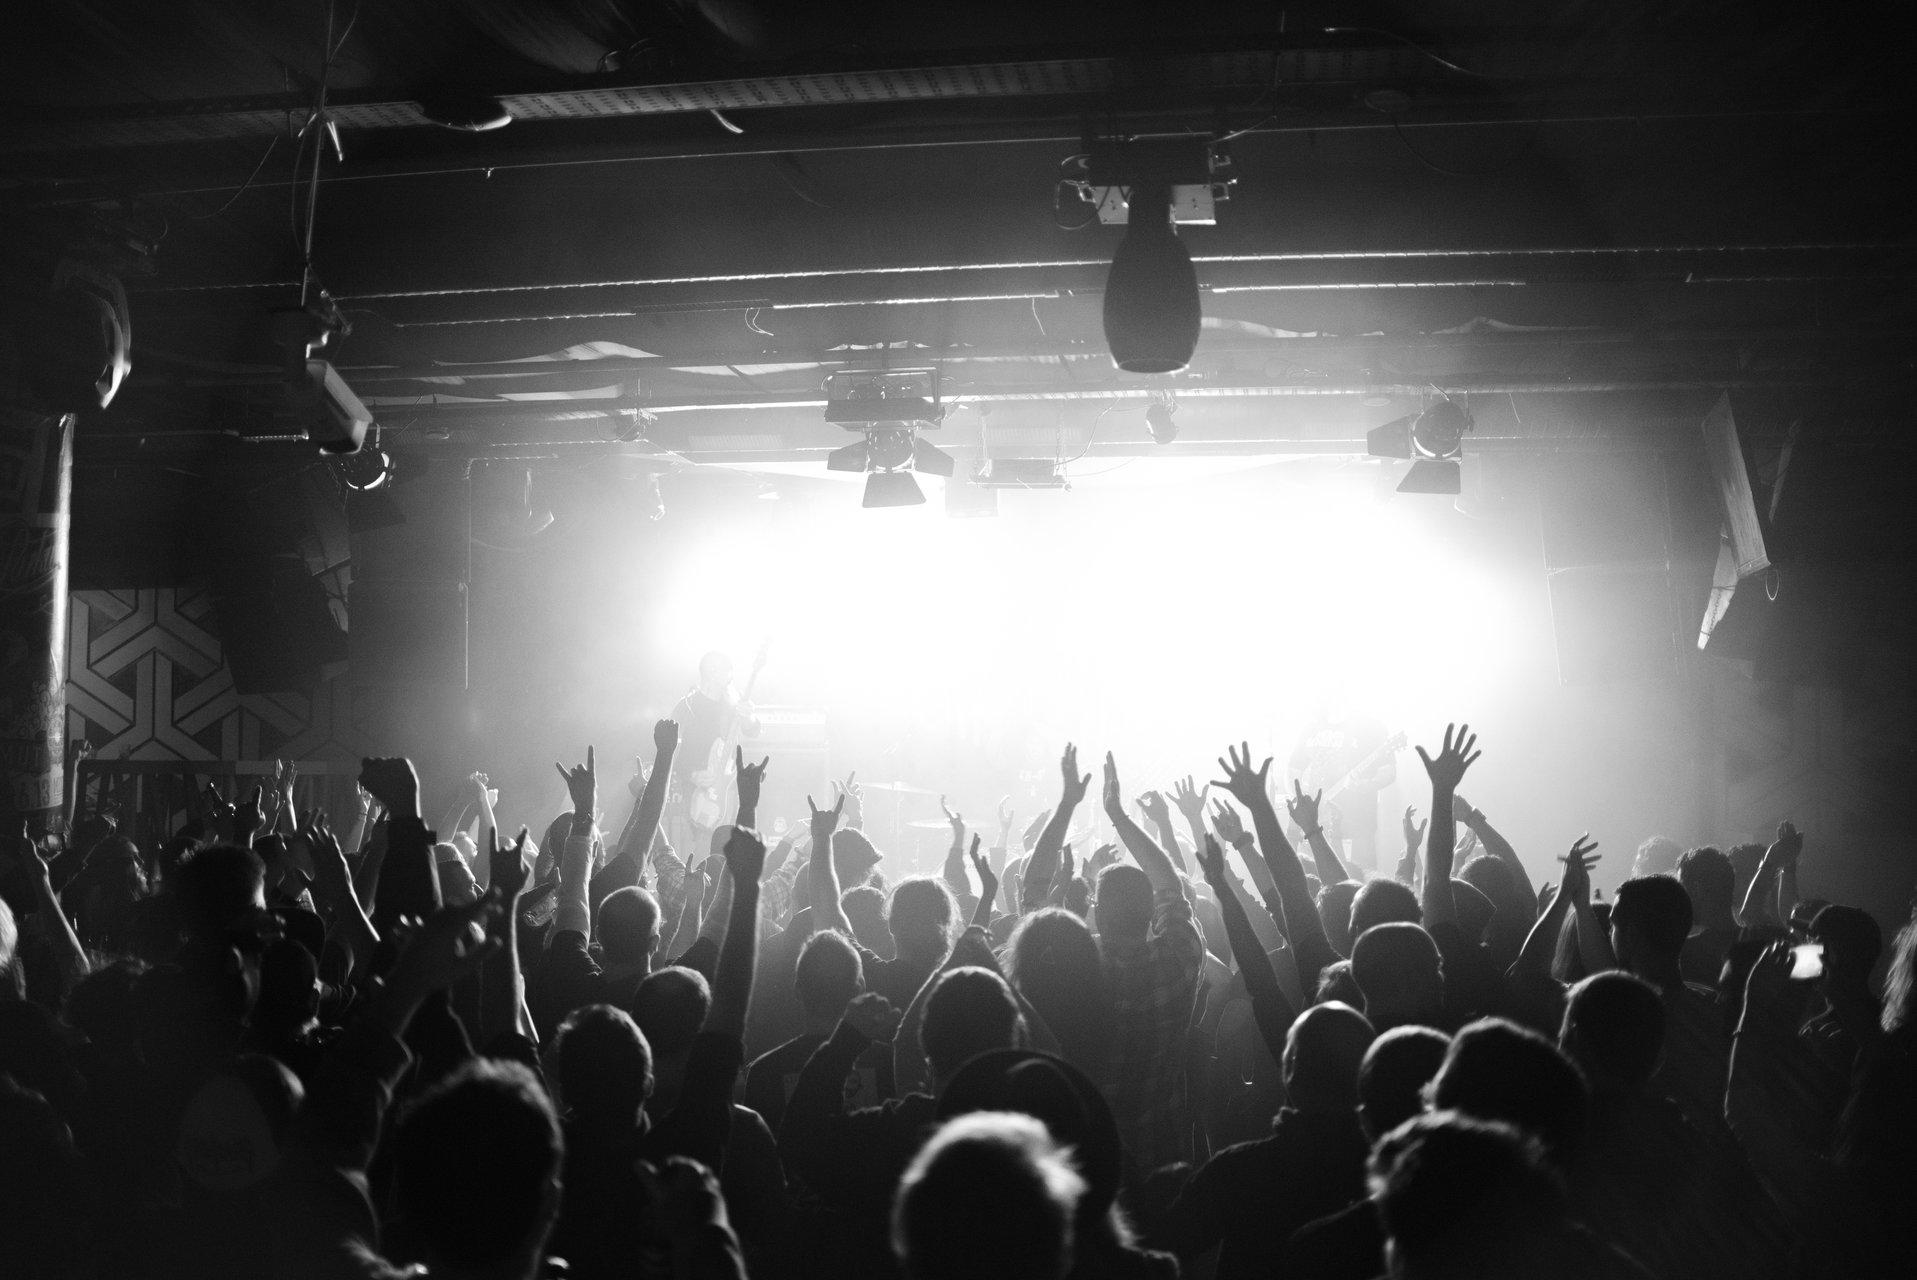 Photo in On stage | Author Ivokbg | PHOTO FORUM